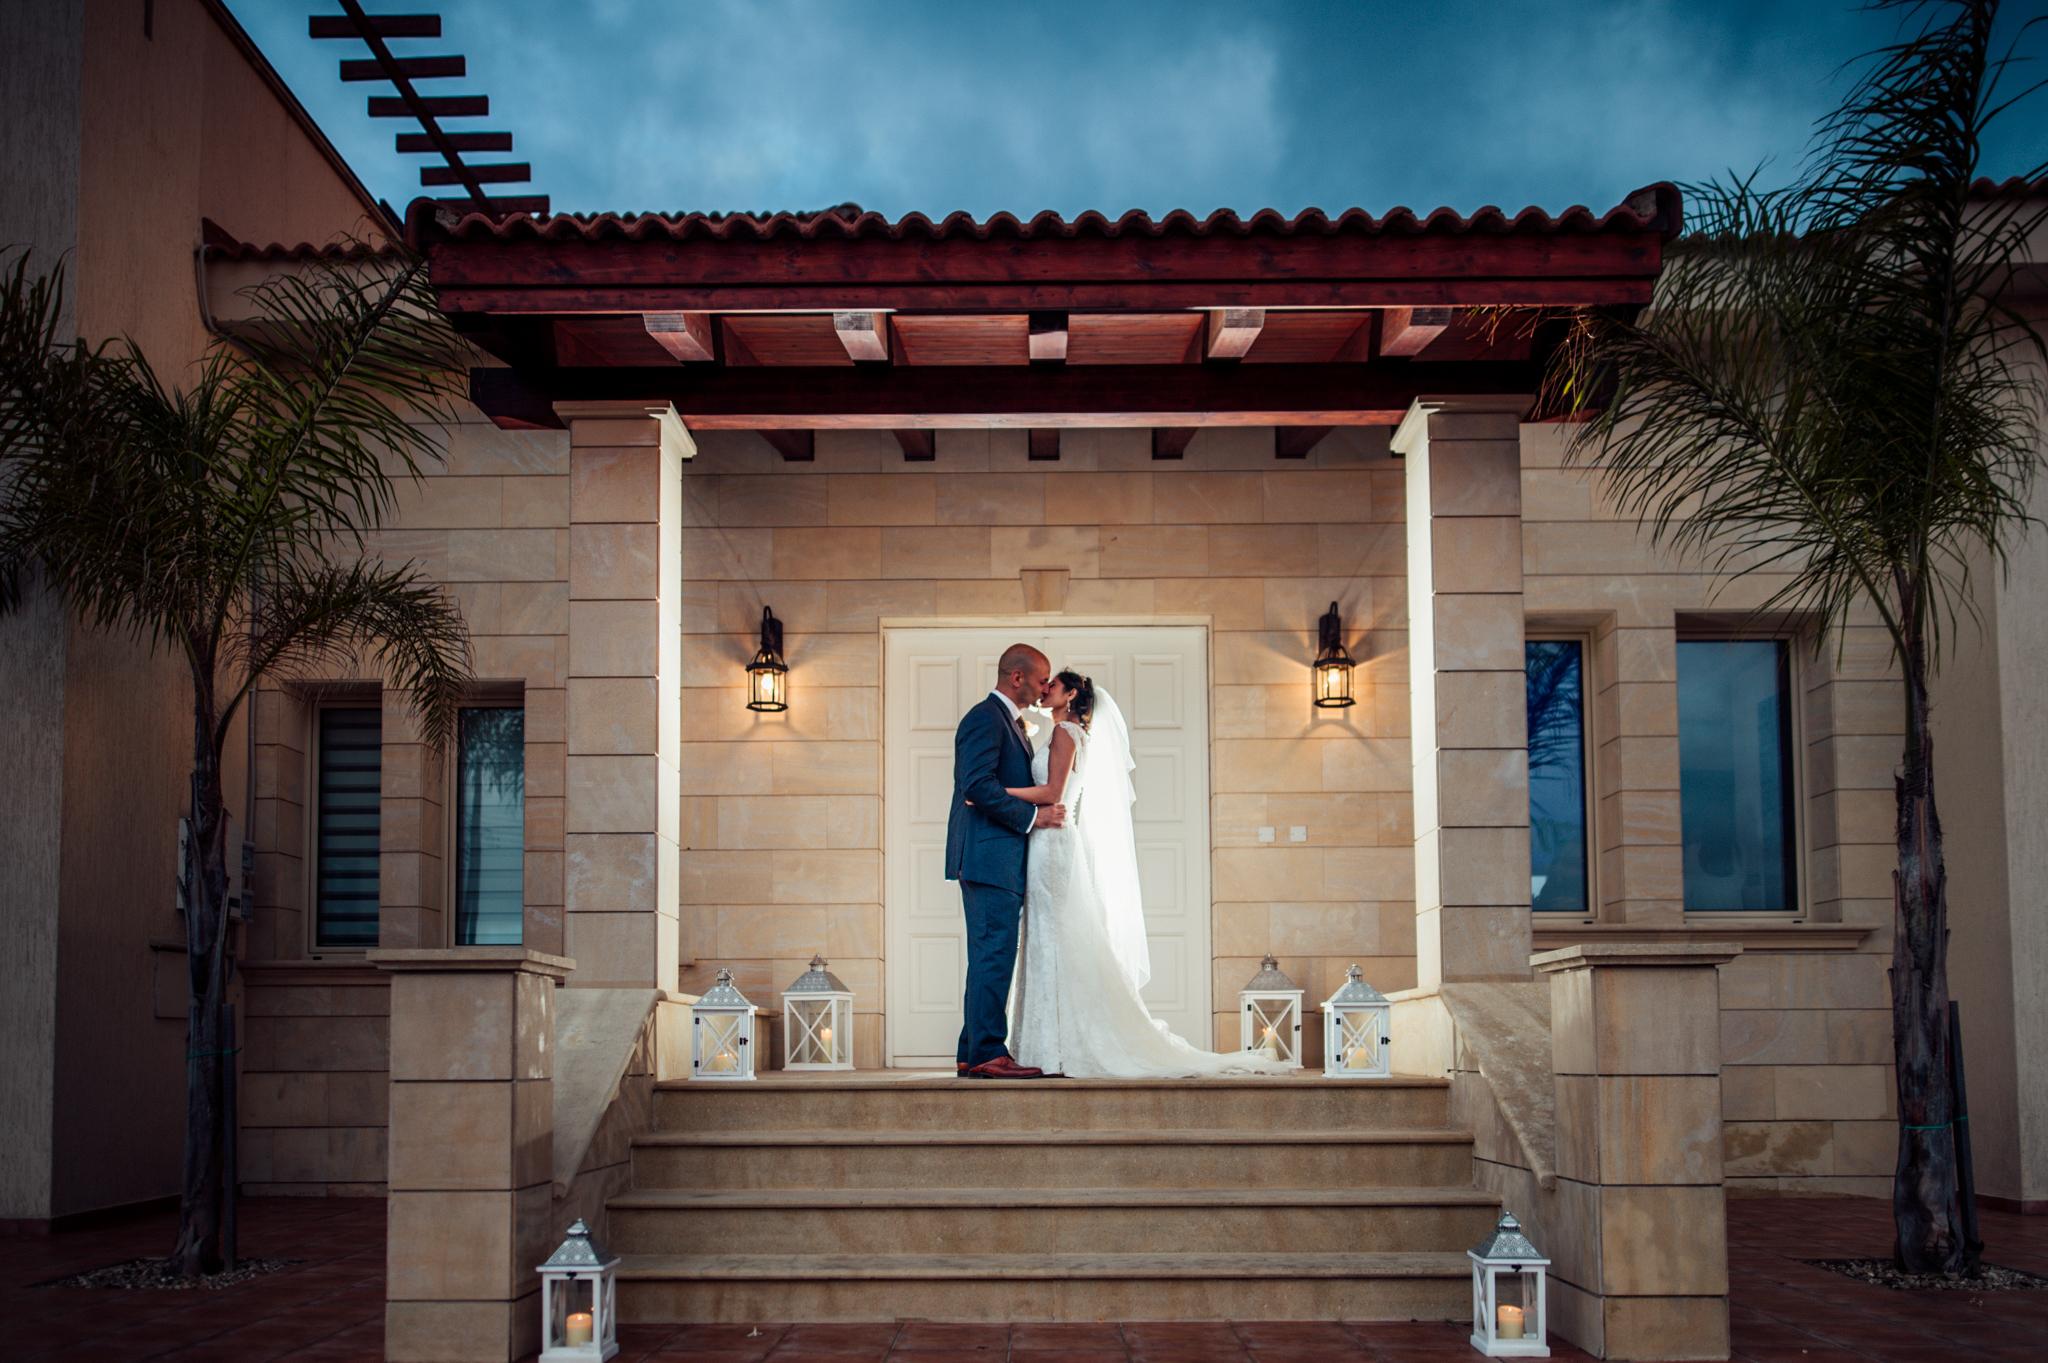 Eagles-Cliff-Villa-Paphos-Wedding-Photographer-59.jpg